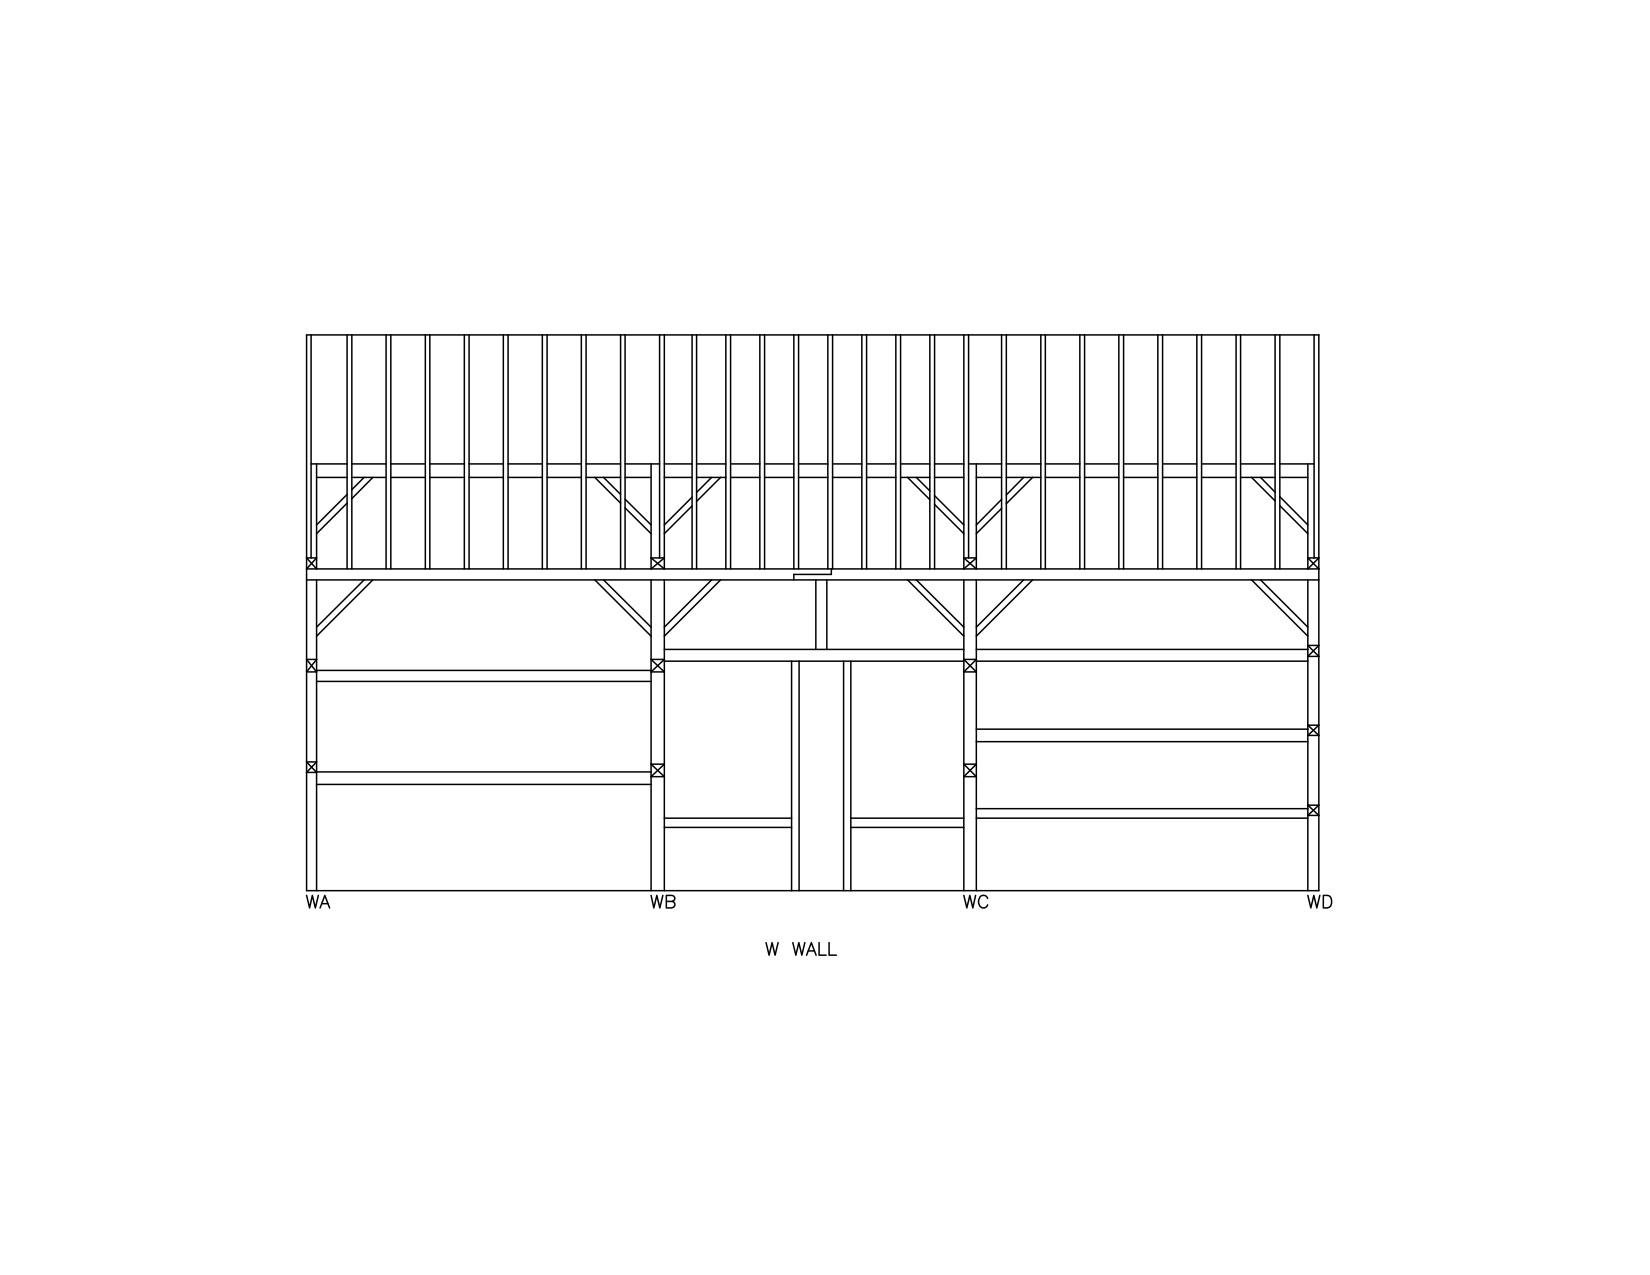 Building 62-W Wall.jpg